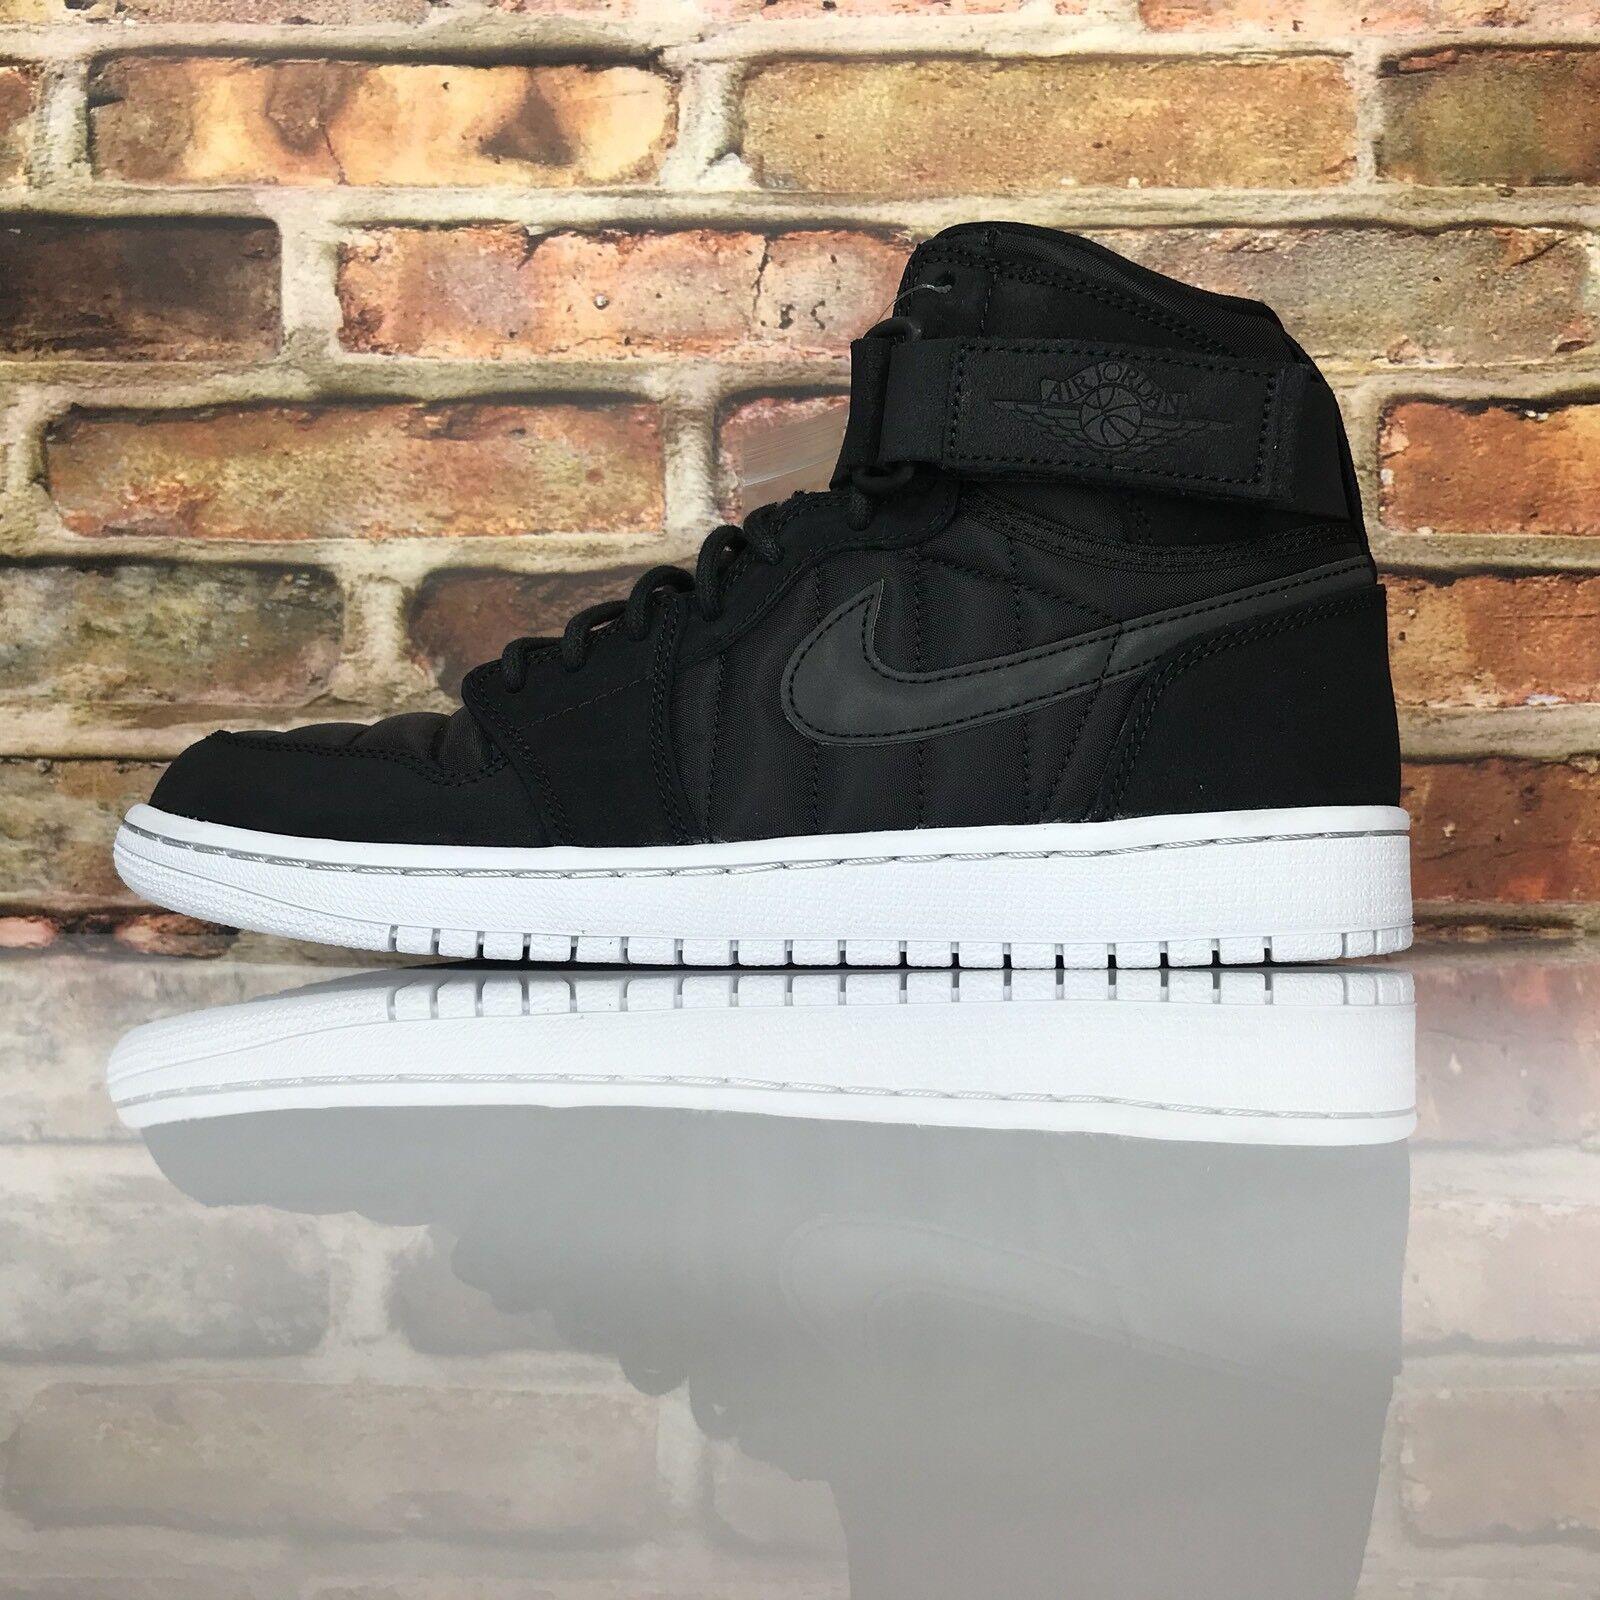 Air Jordan 1 High Strap Padded Pack Men Size 8.5 Black Pure Platinum 342132 004